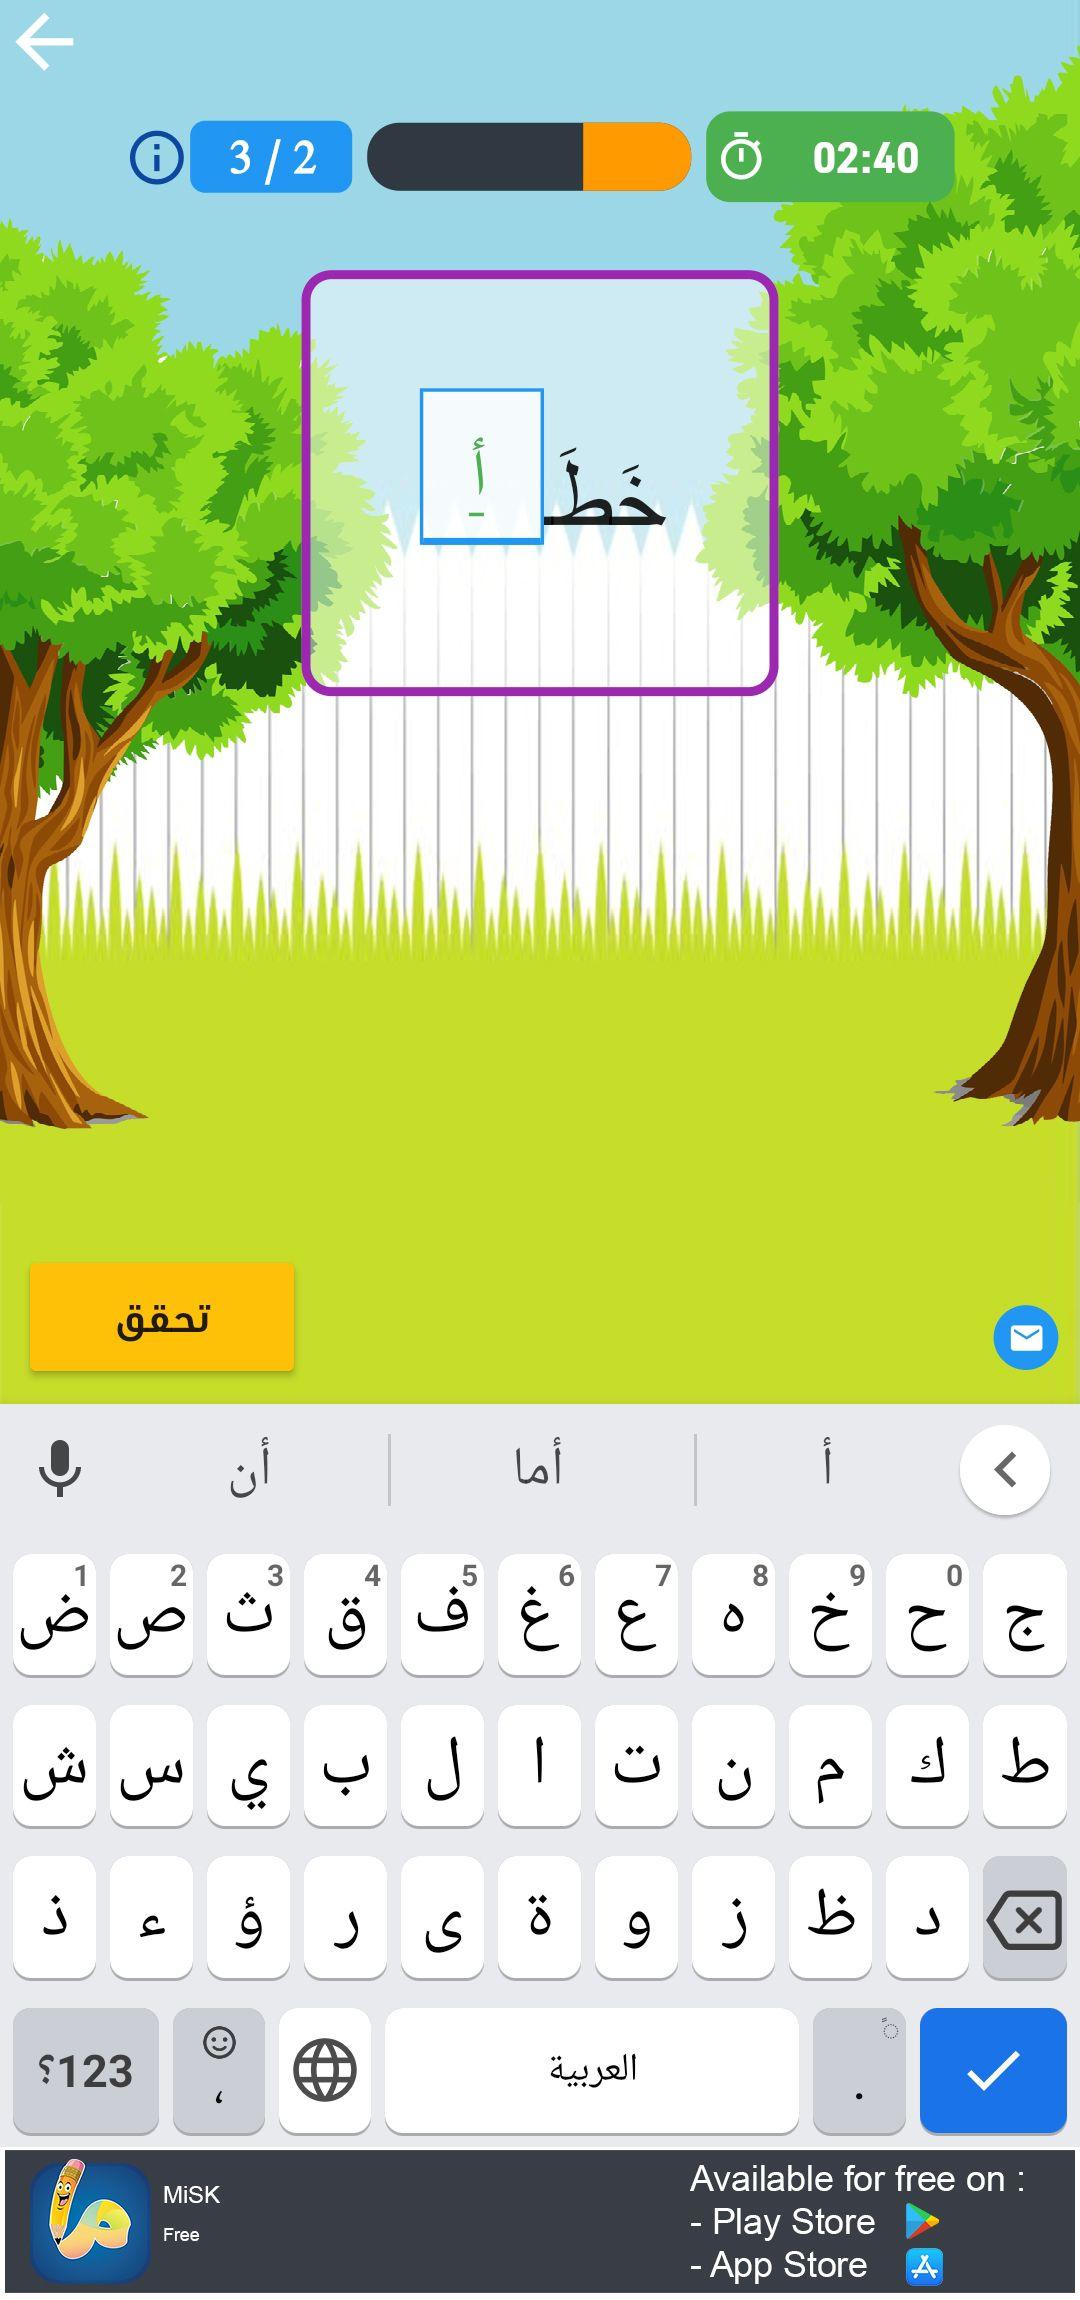 Misk App Screenshot 9 In 2021 App Play Store App App Store